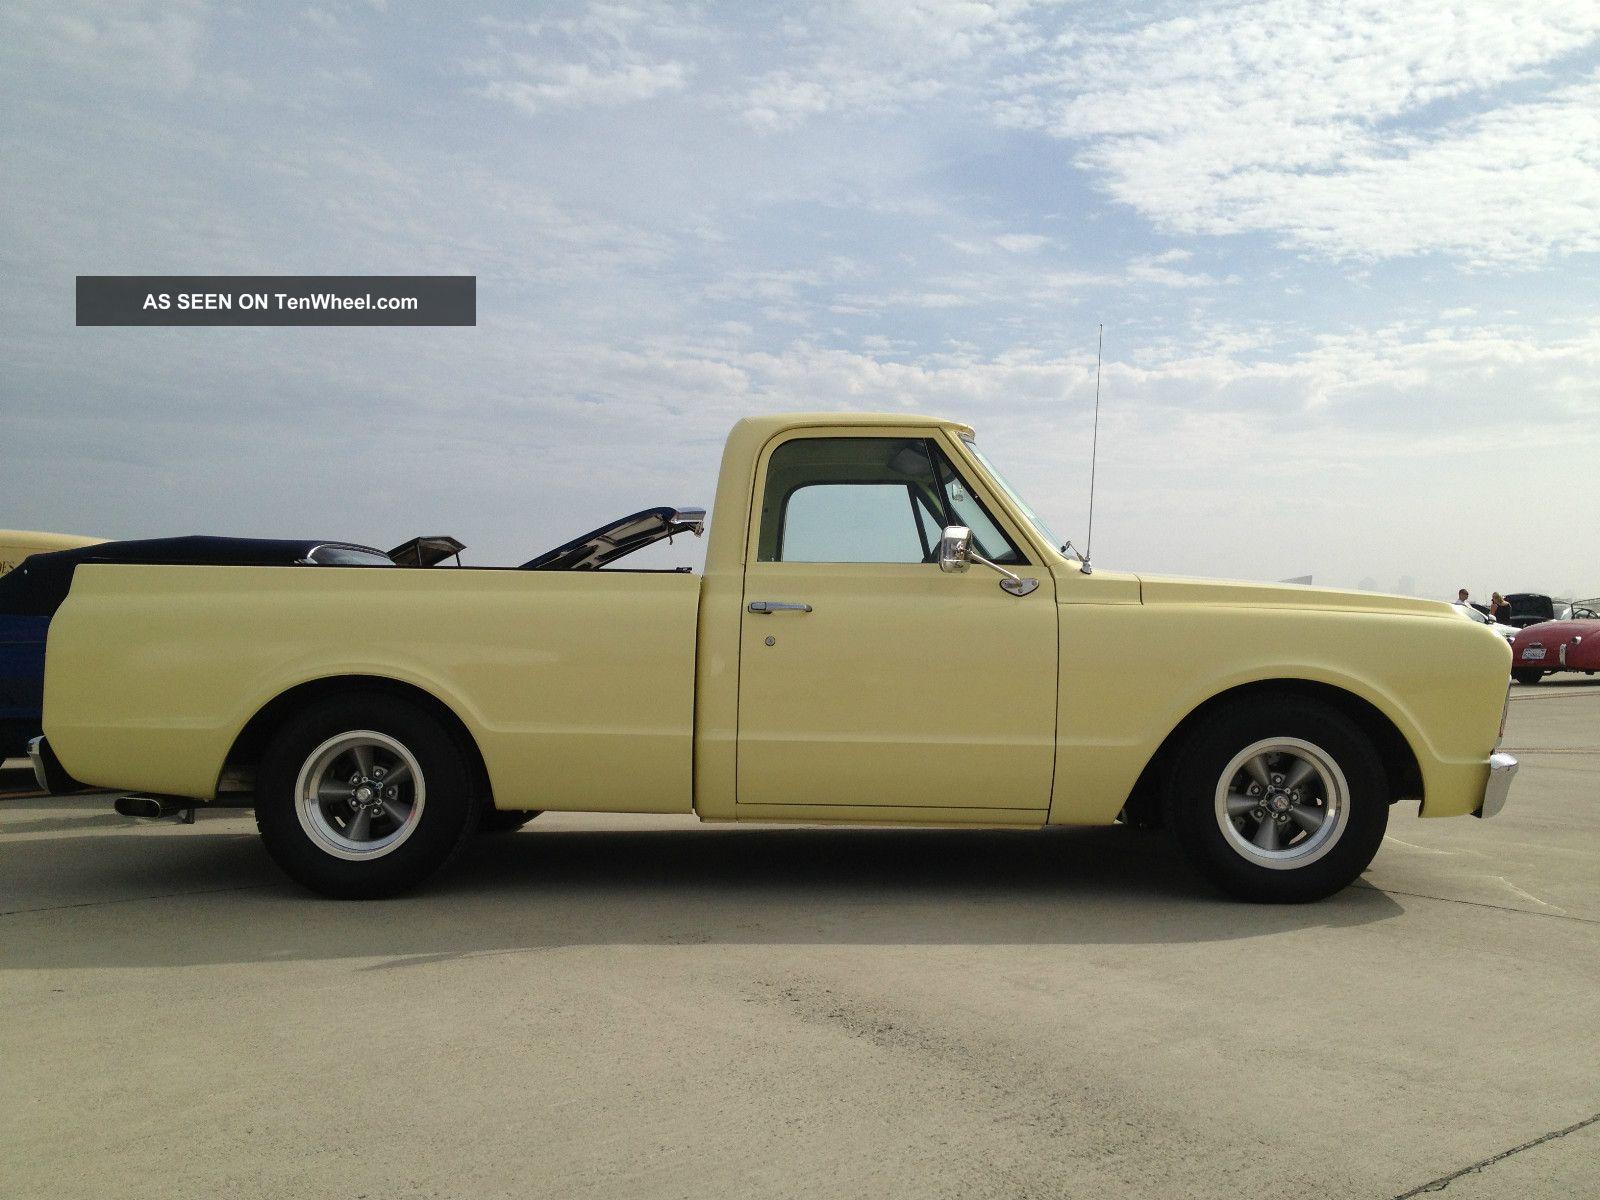 1967 Gmc Chevrolet Short Bed Pickup